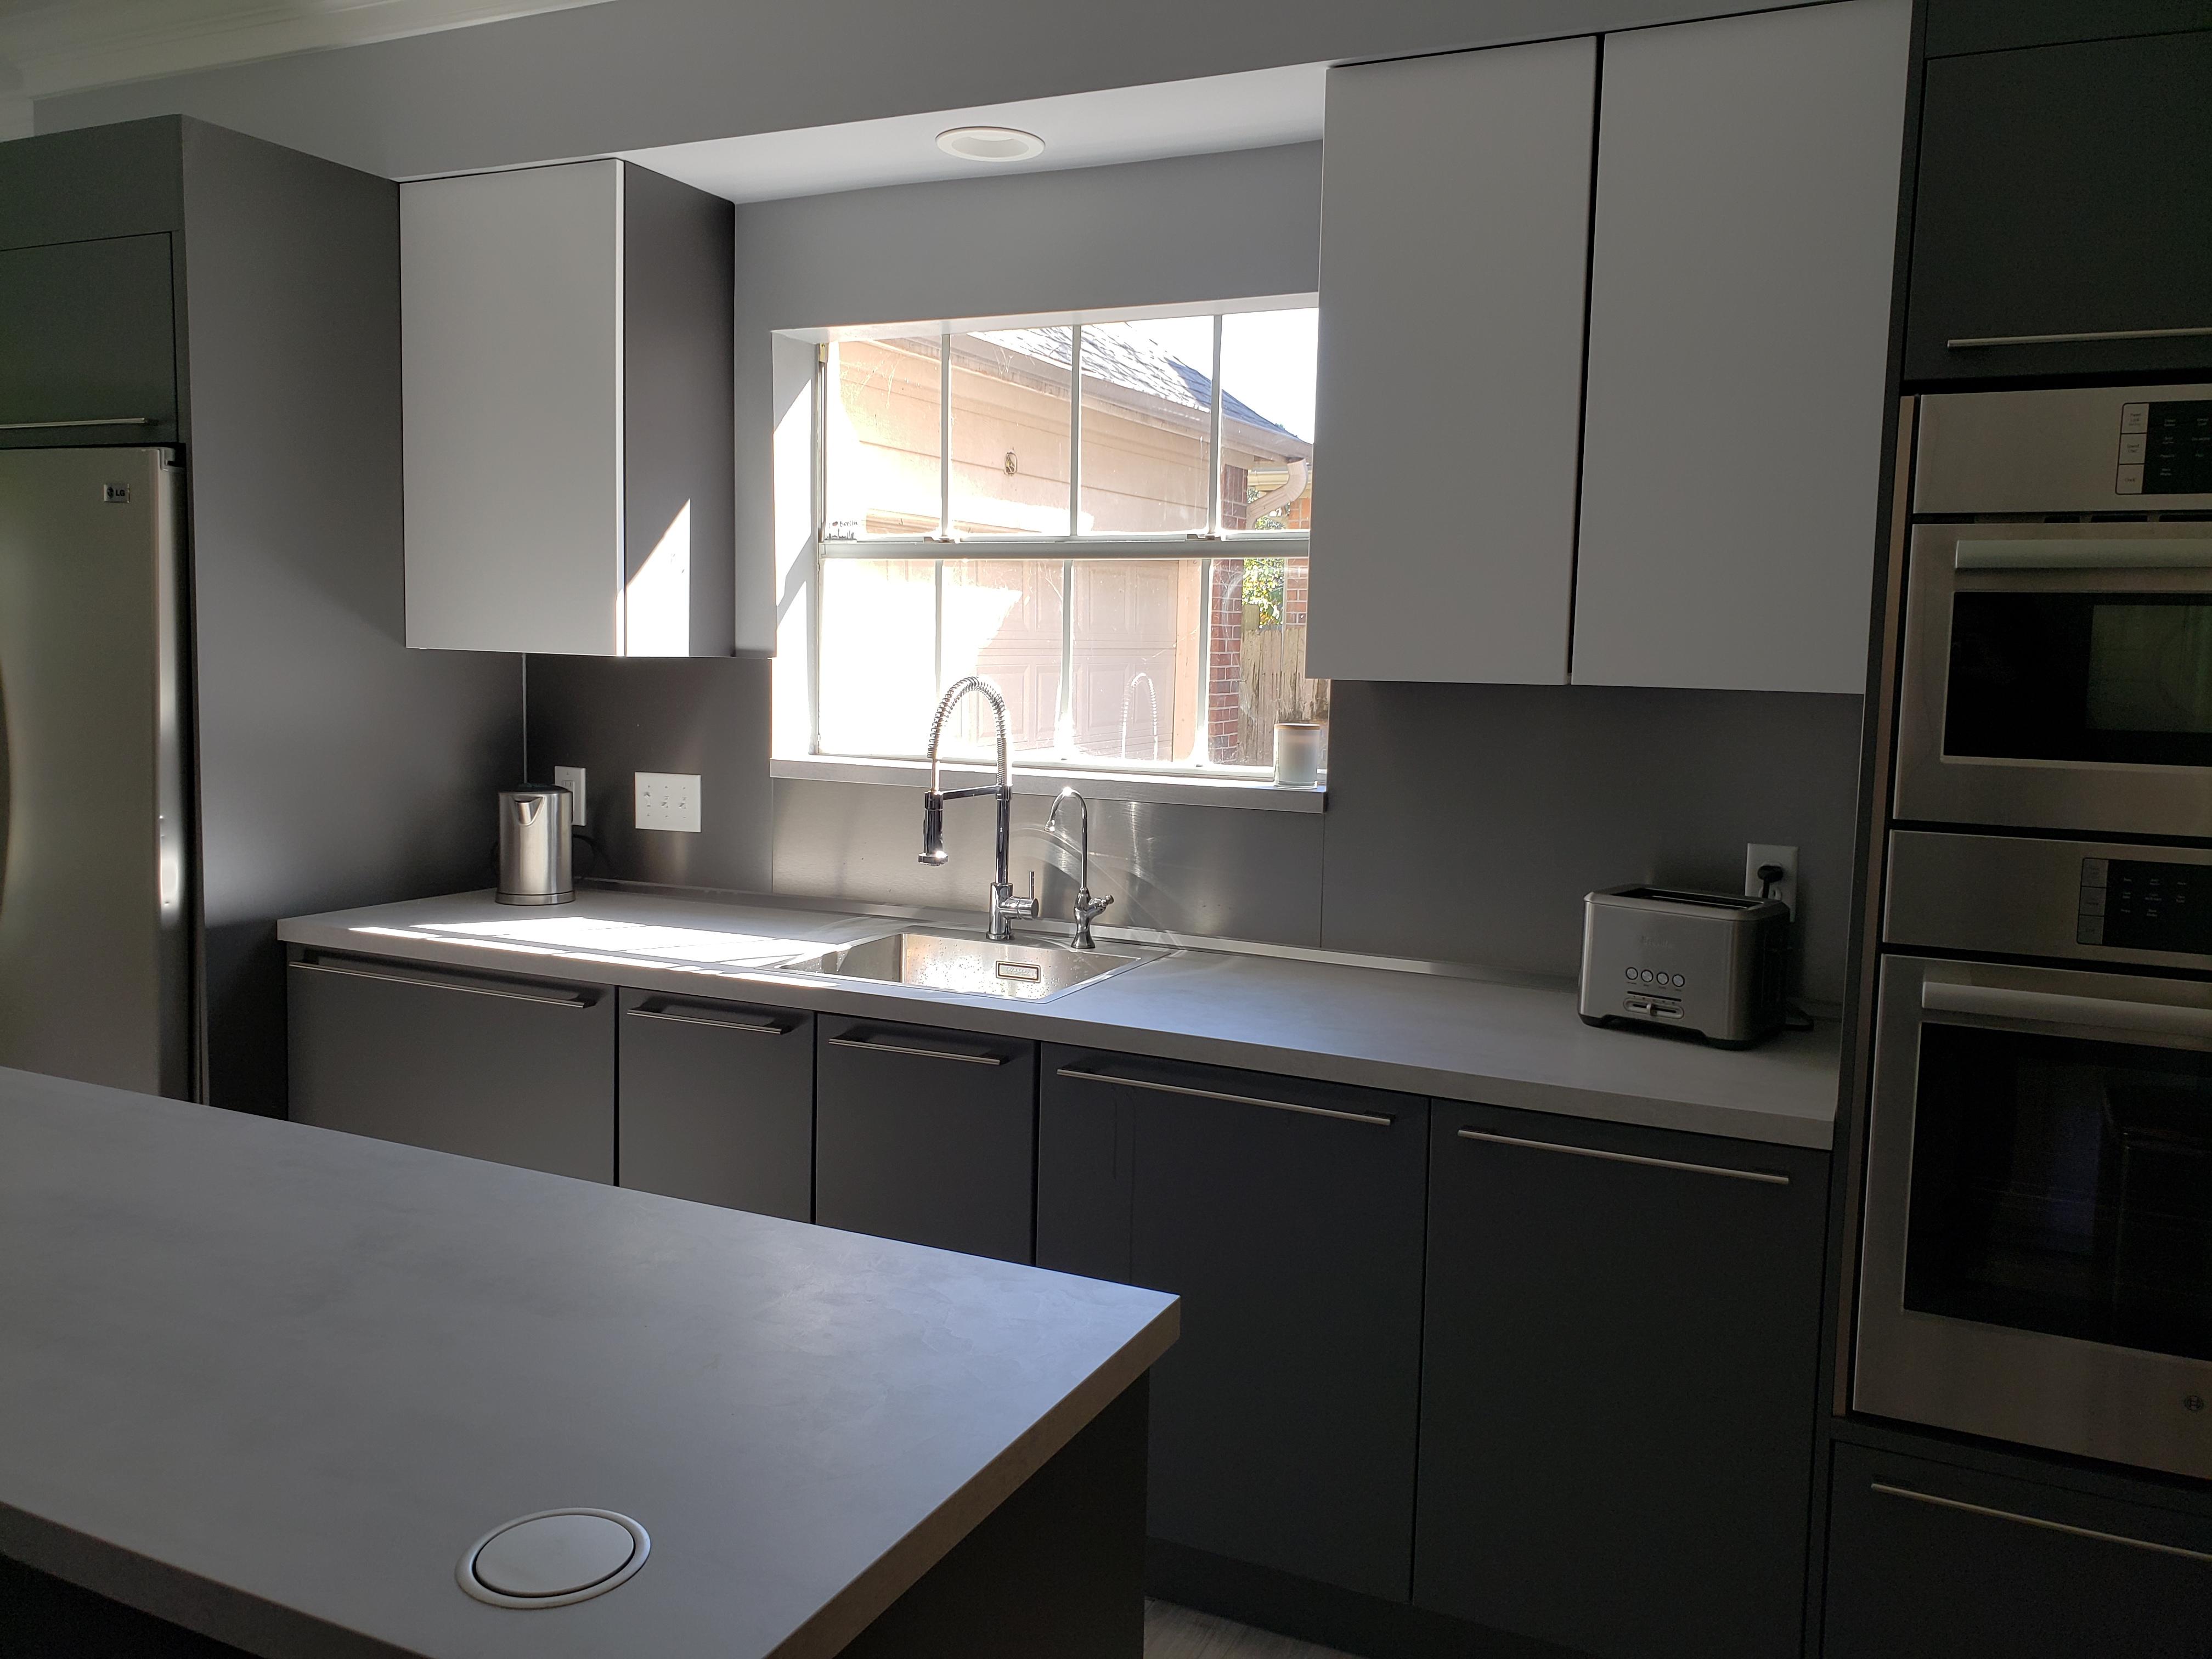 modern kitchen cabinets, Katy/TX